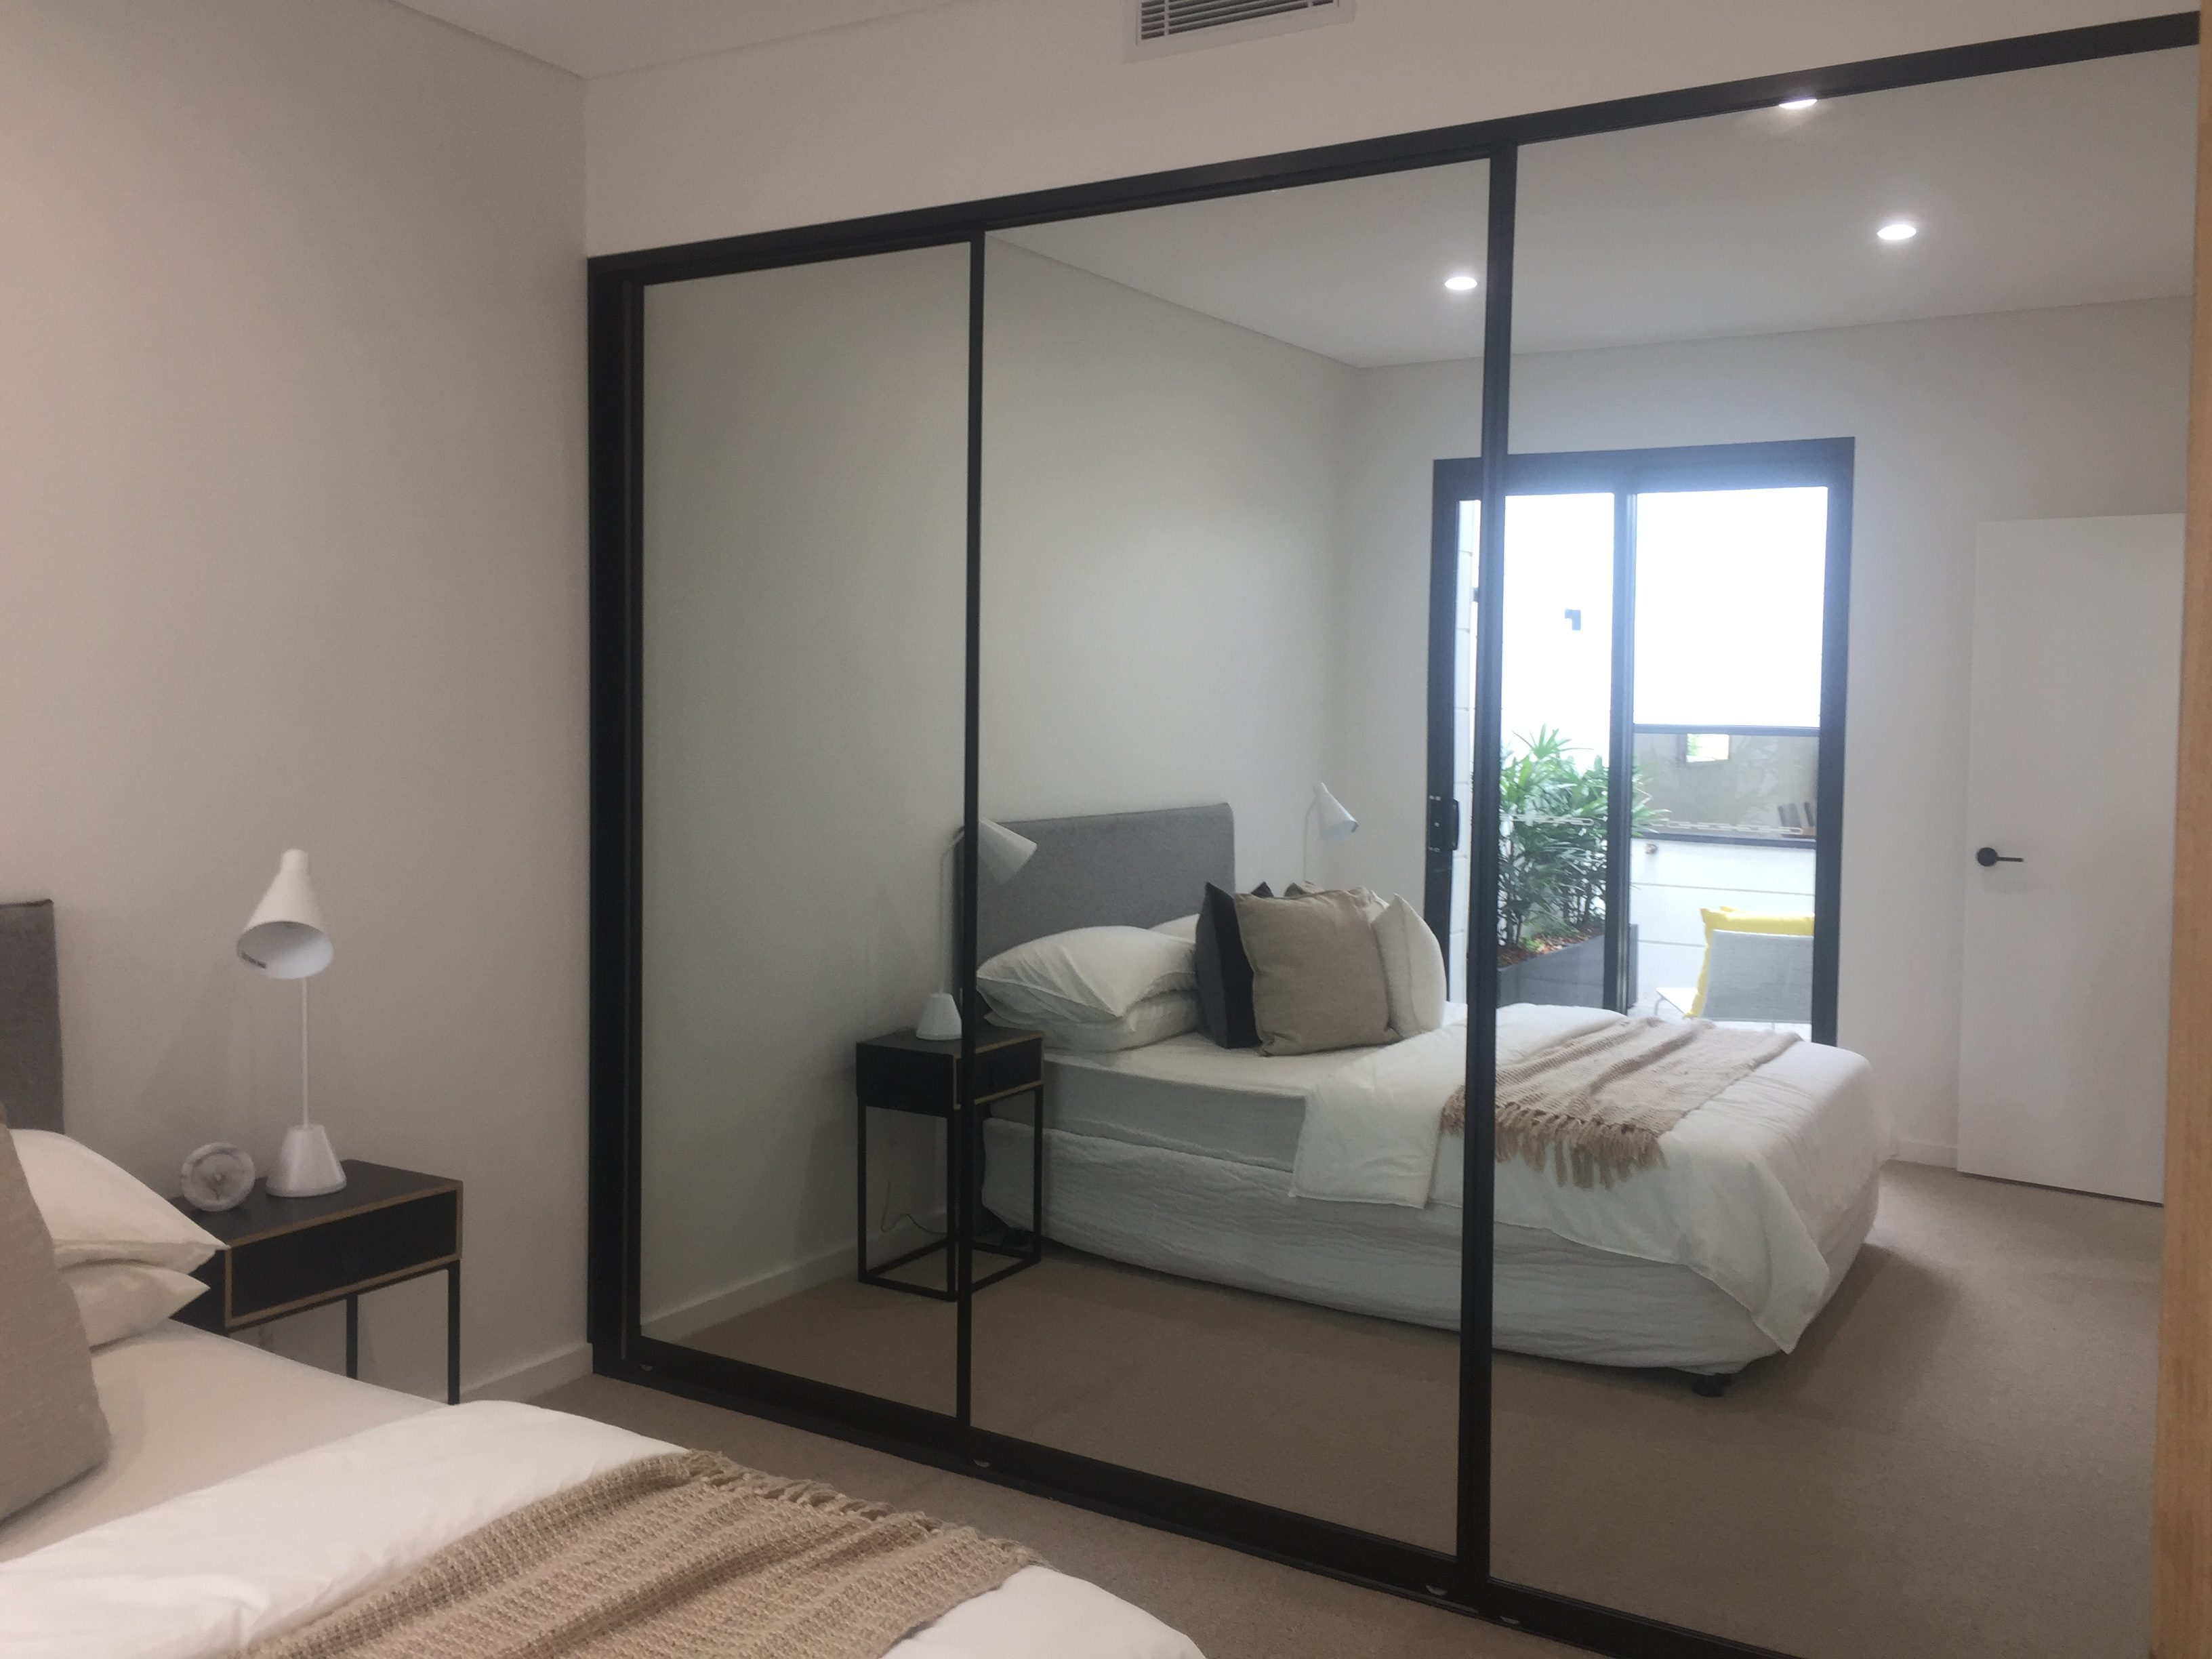 Wardrobe Doors Glass And Mirror Built In Wardrobes